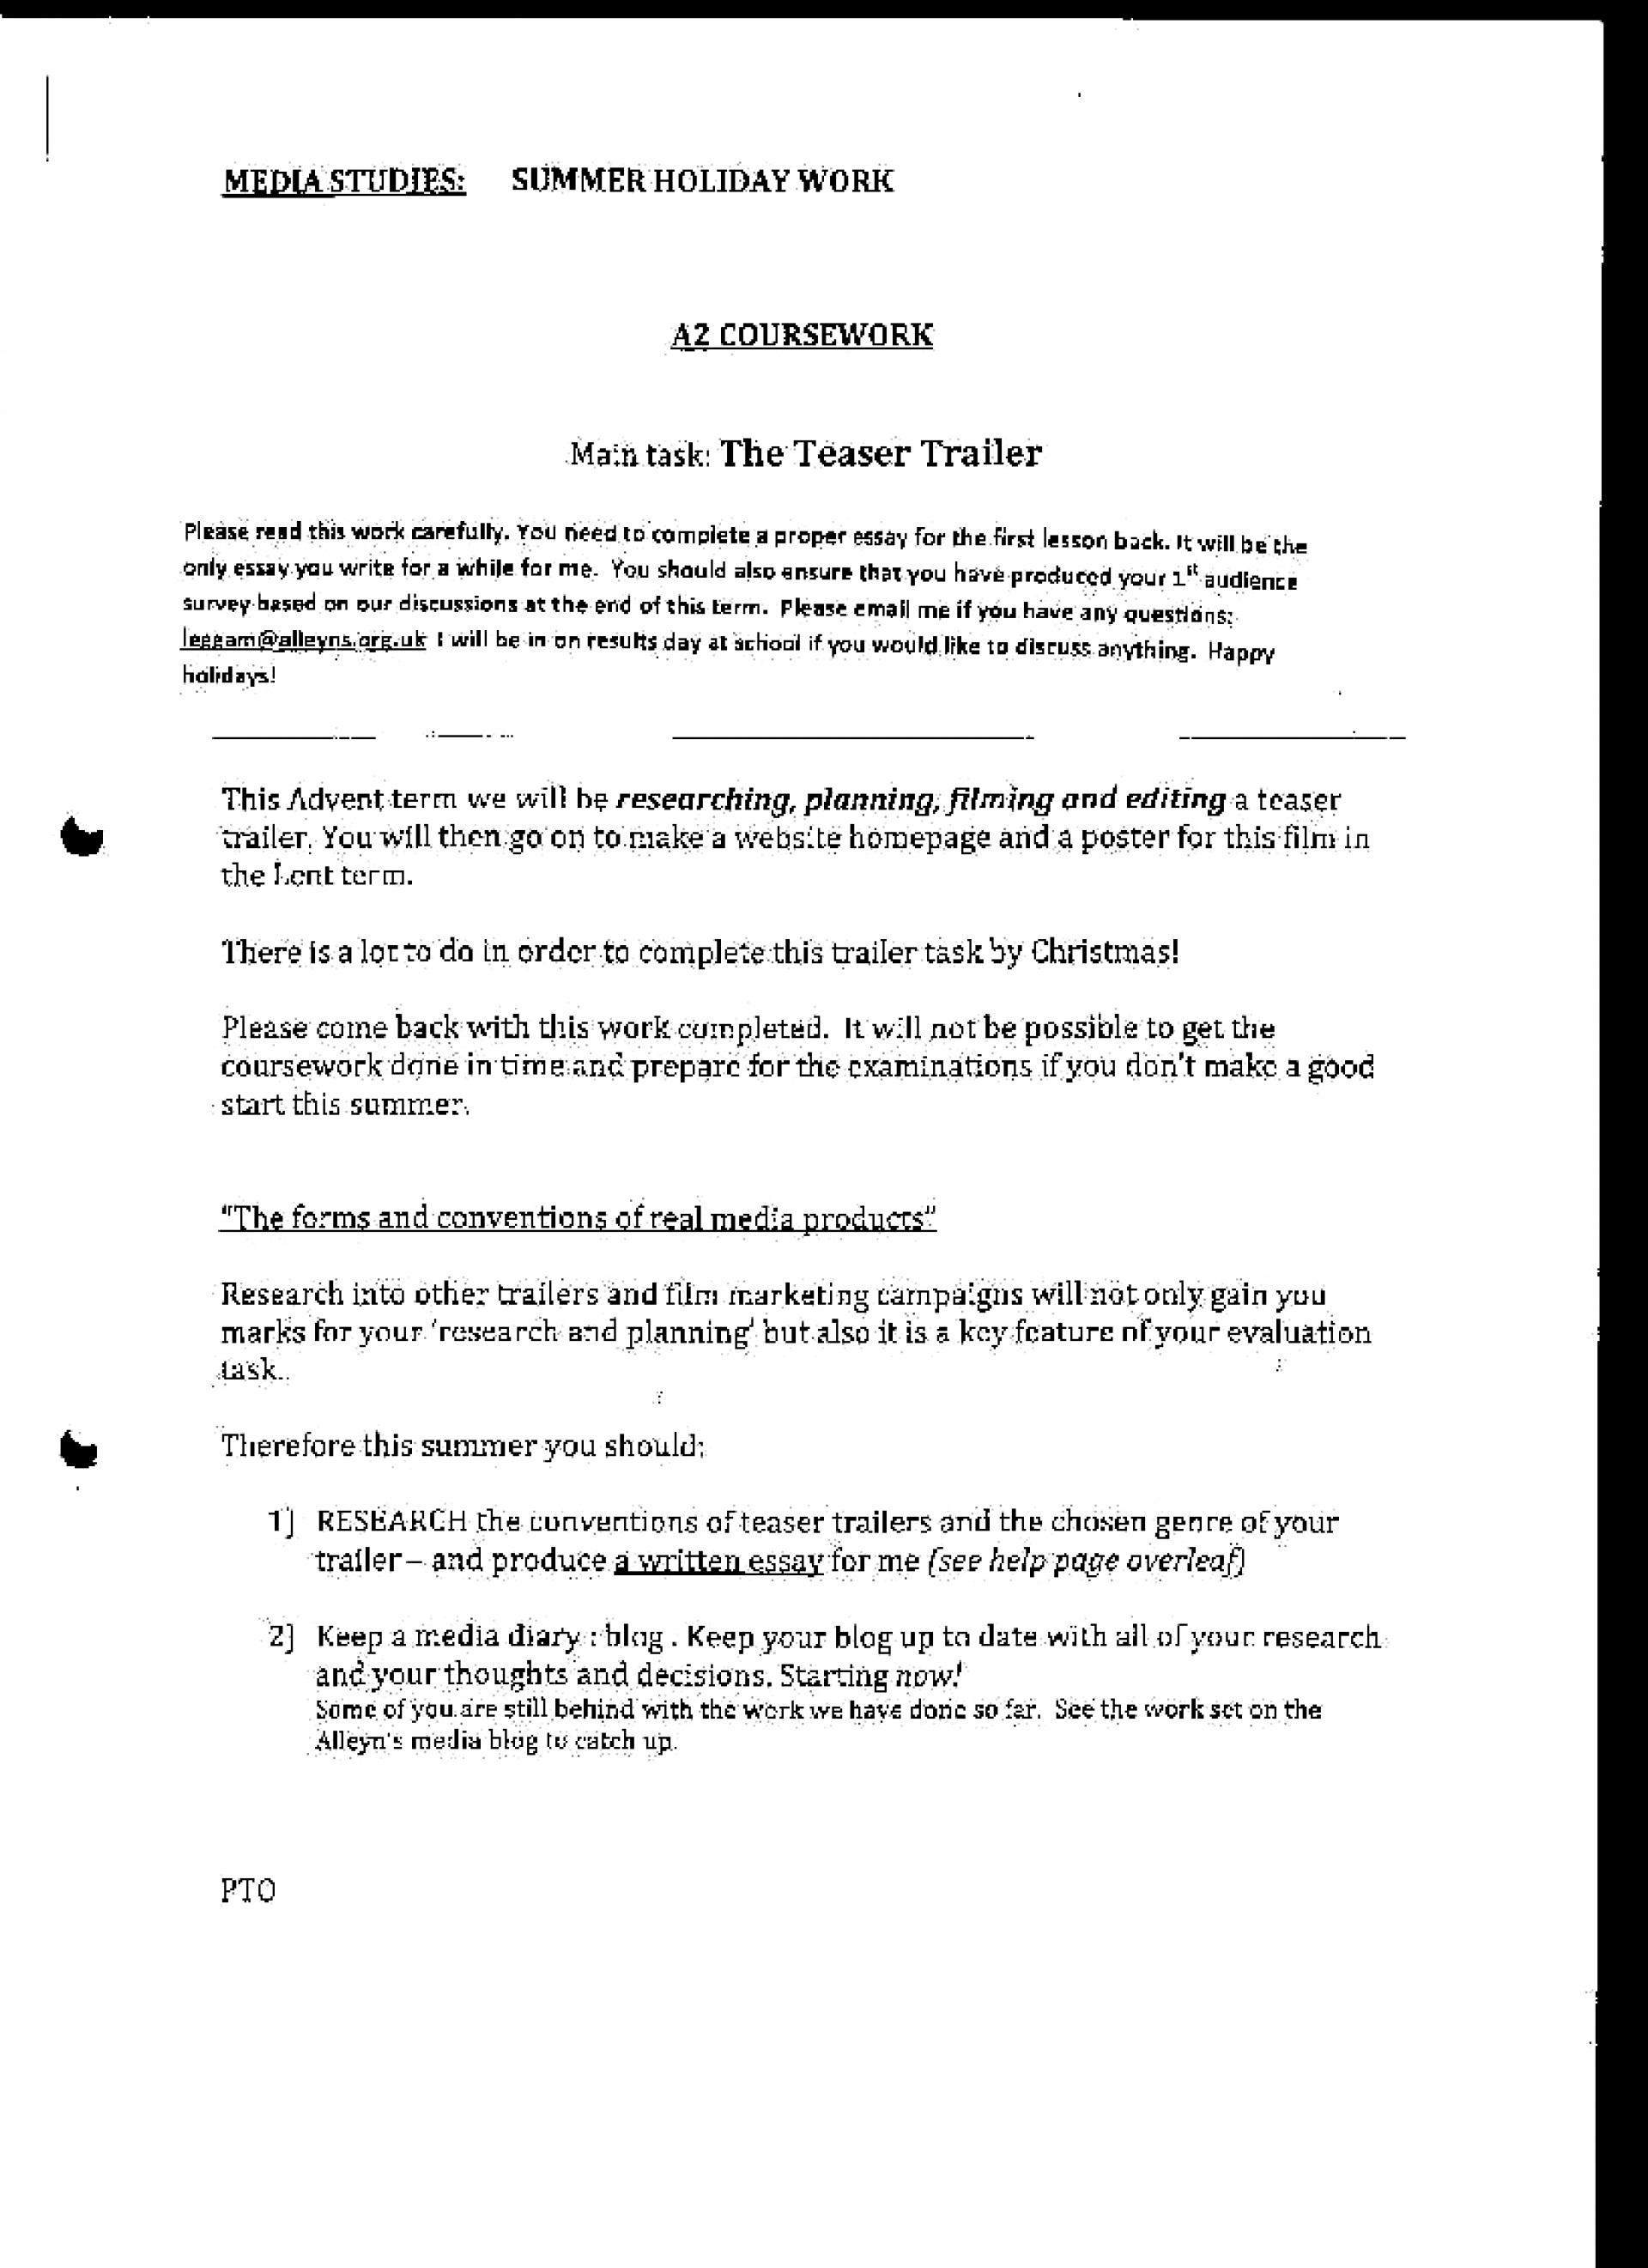 023 Essay Example Yr2b122bholiday2bwork2bpage2b1 Summer Frightening Vacation For Class 6 In Urdu On Marathi 1920